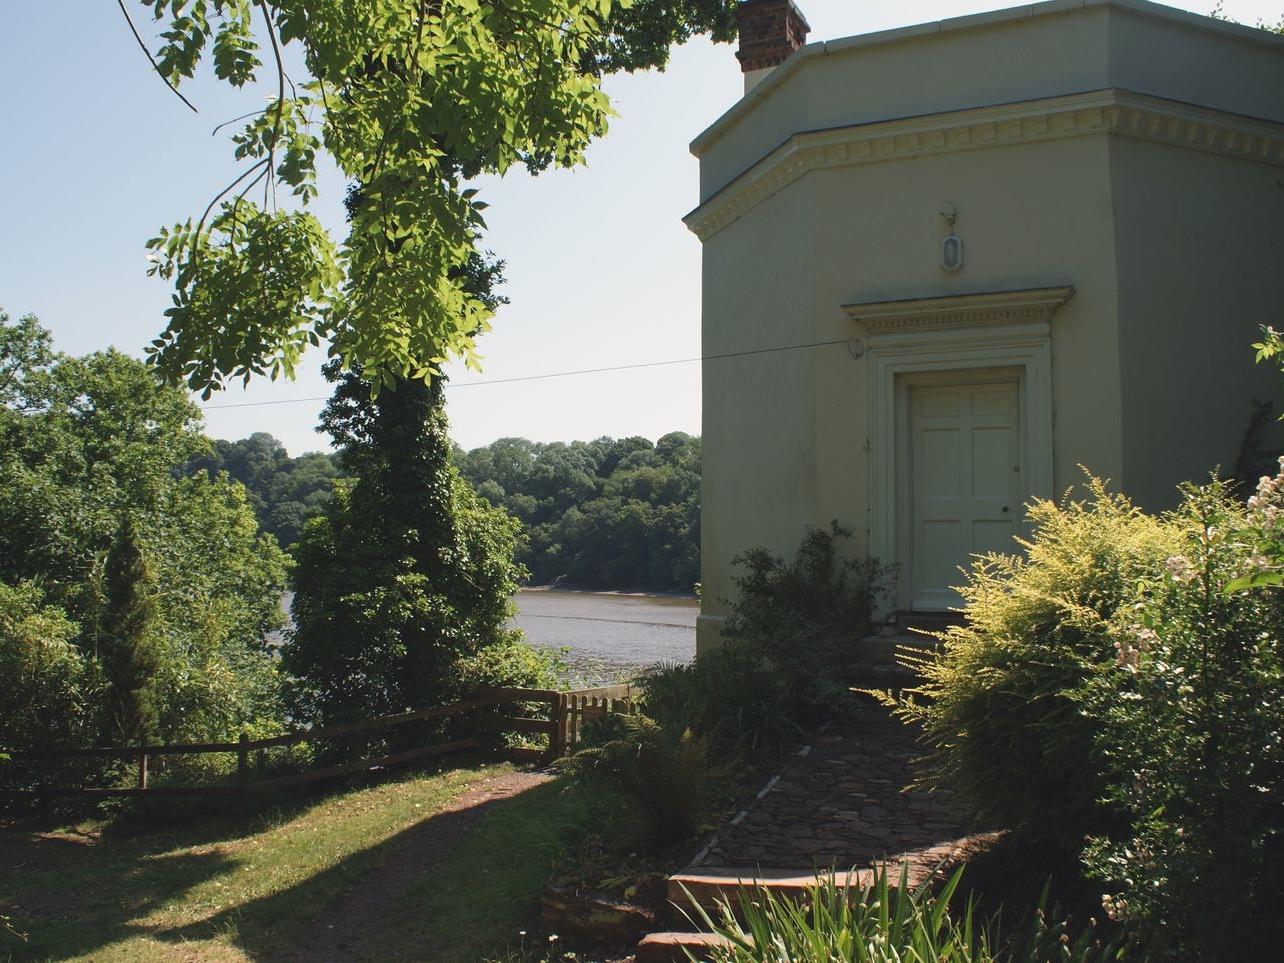 The Bathing House